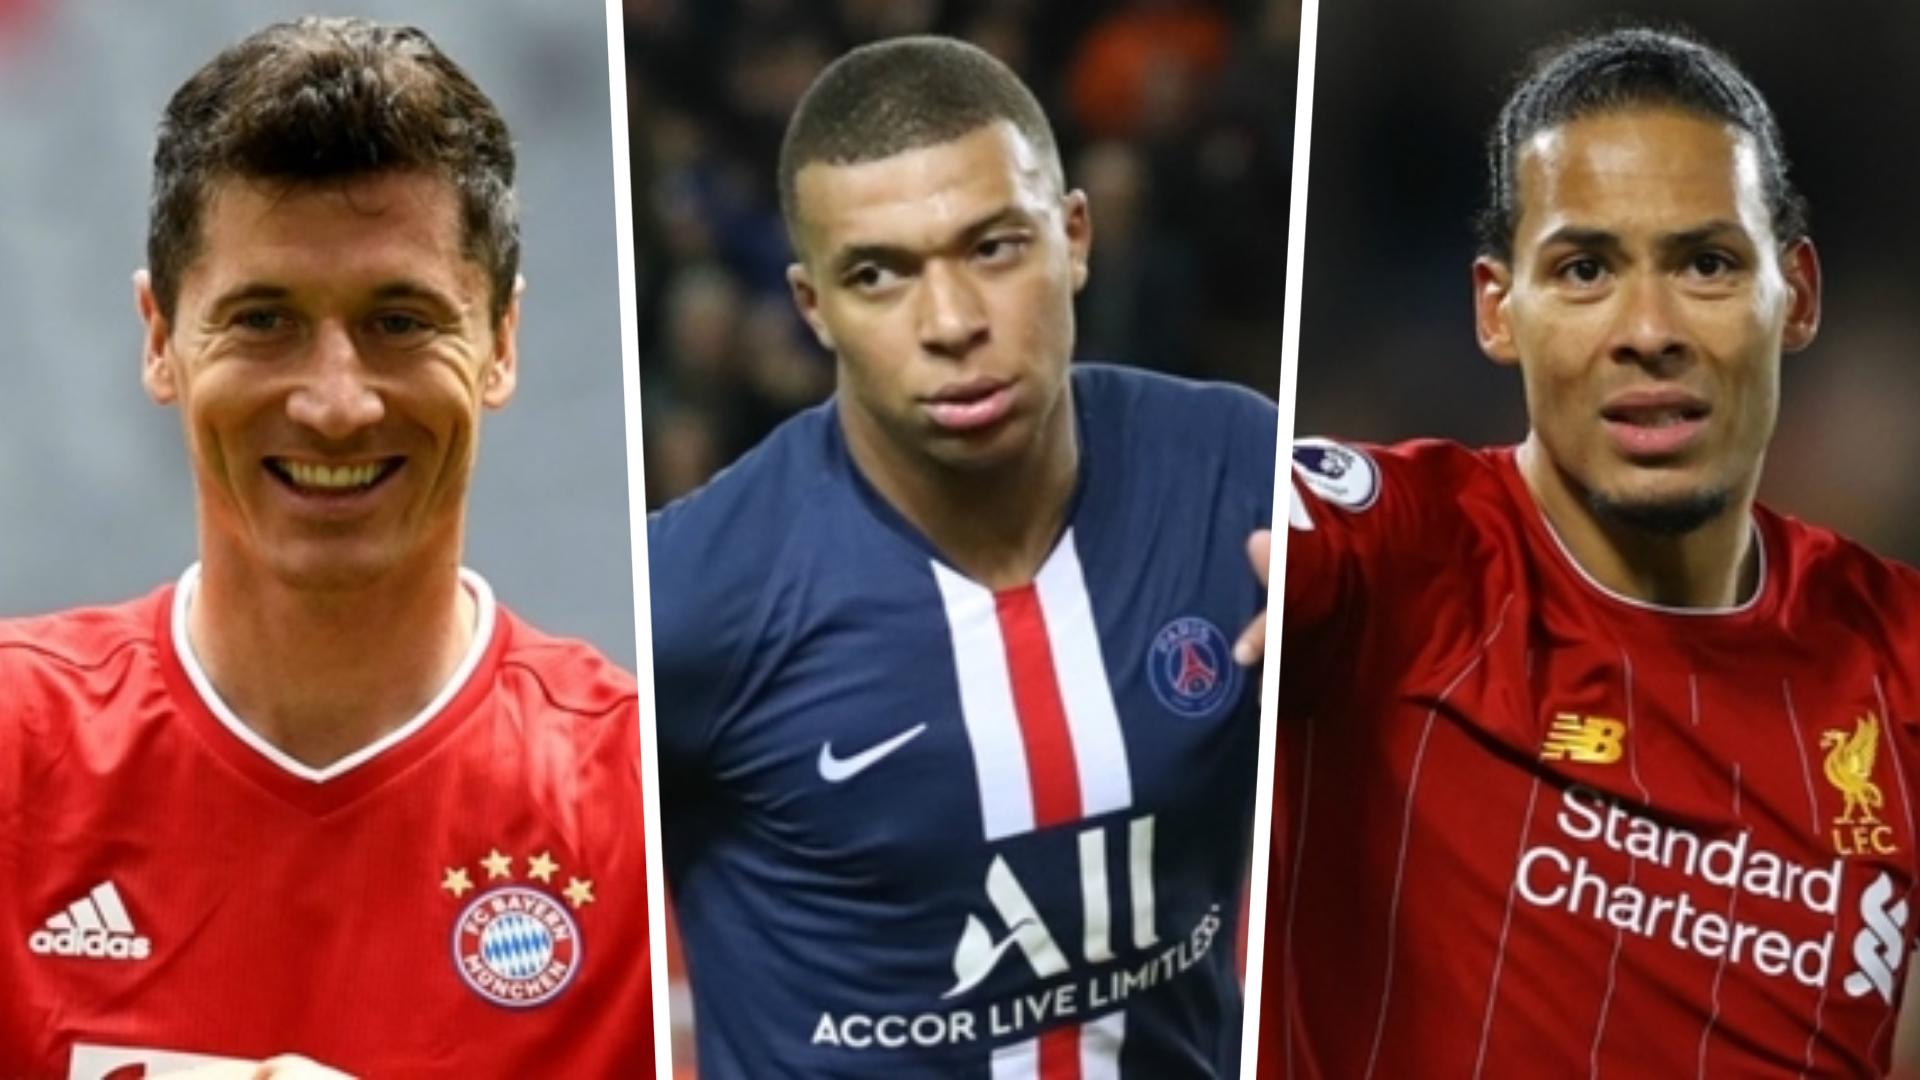 Manchester City should spend £700m Messi money on Lewandowski, Van Dijk and Mbappe, claims Mills